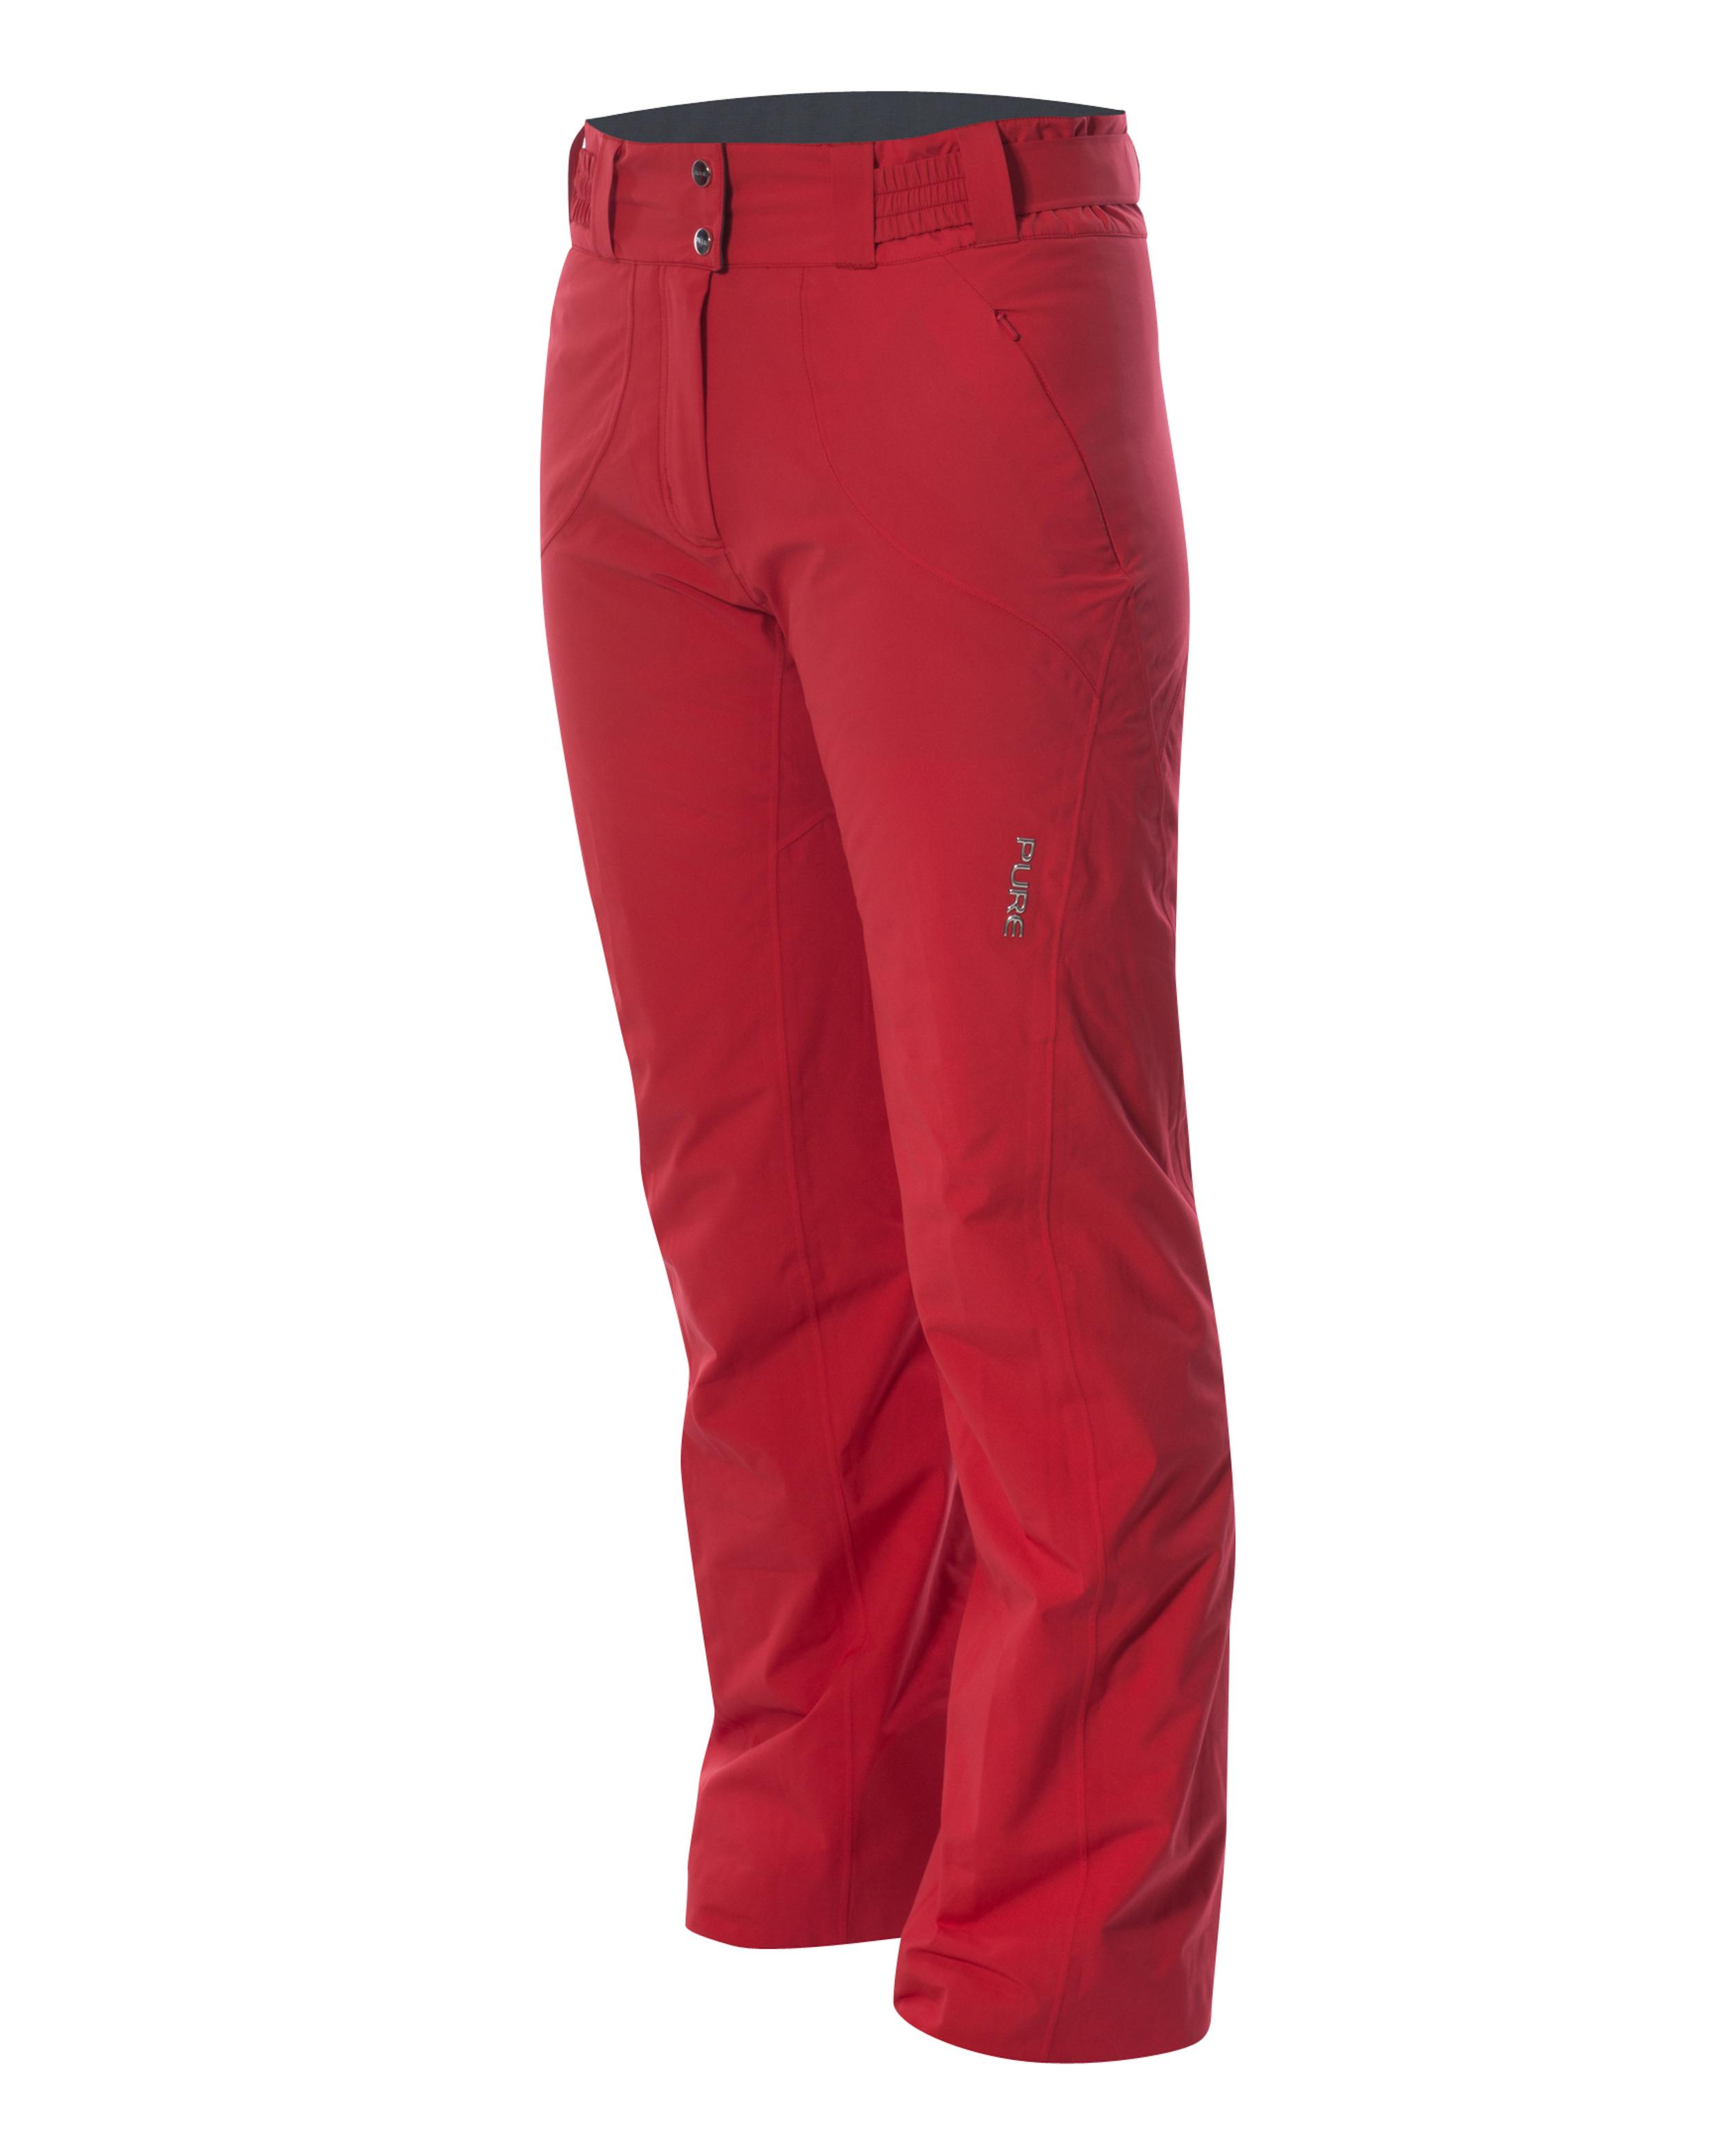 Aspen Women's Pure Snow - Red